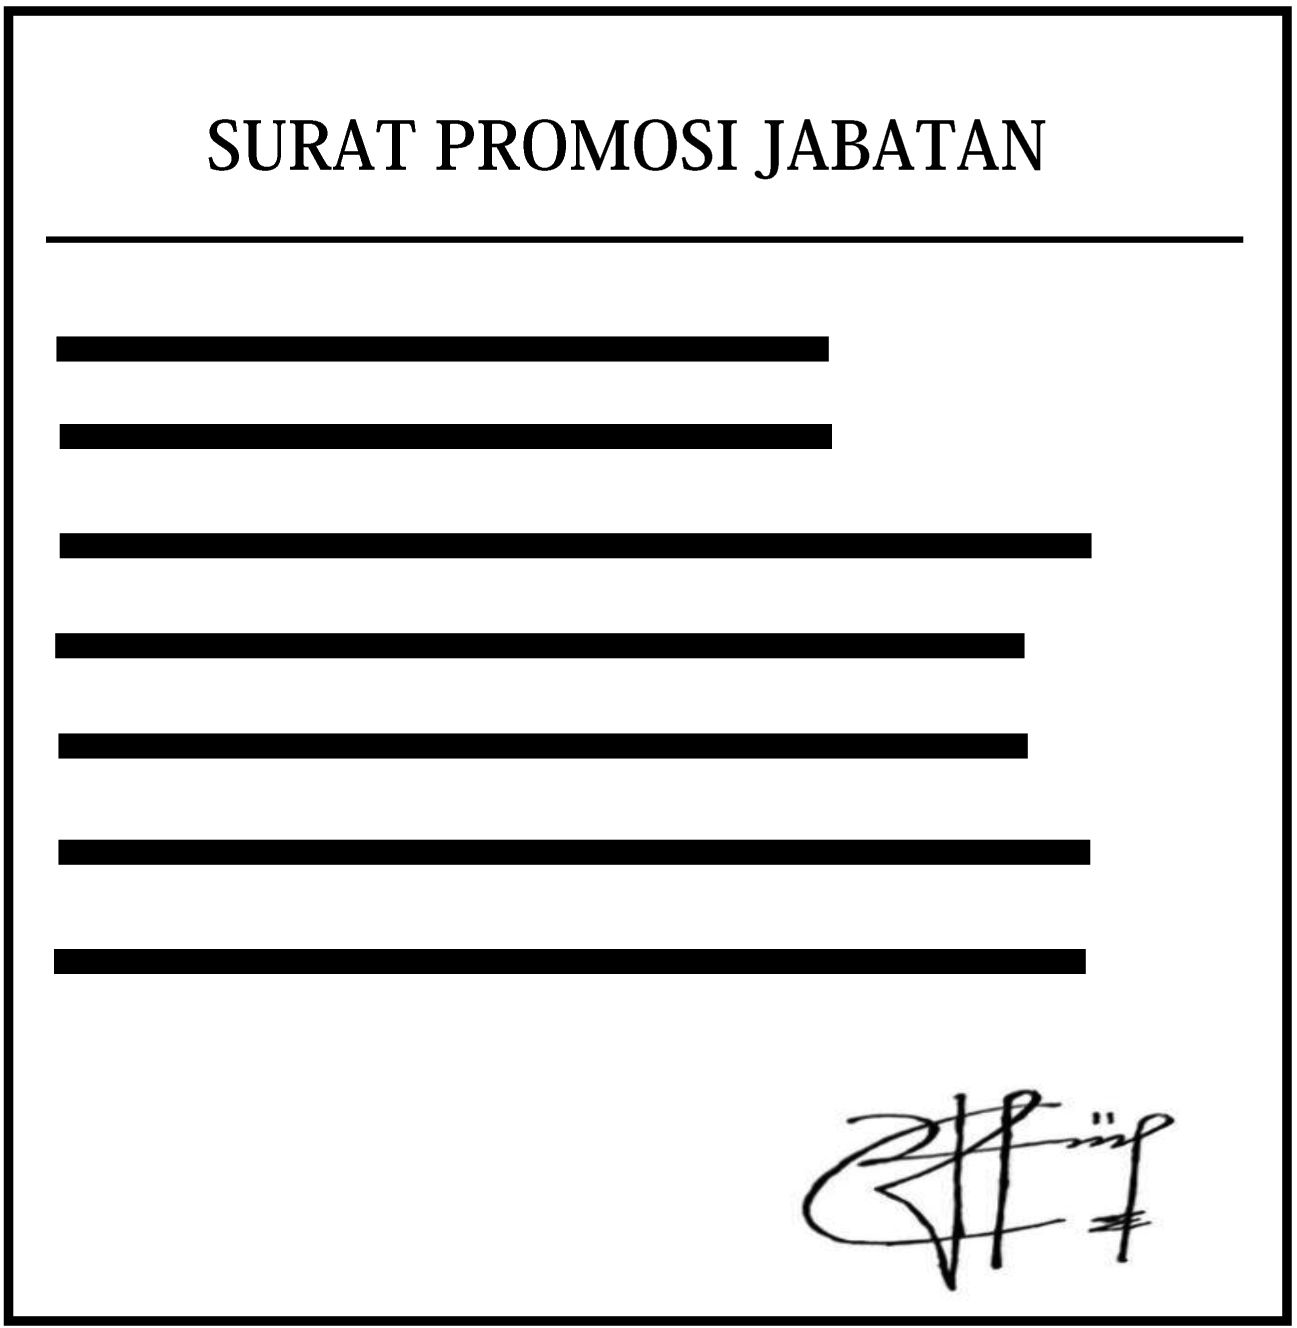 Nulis Coy Contoh Surat Promosi Jabatan